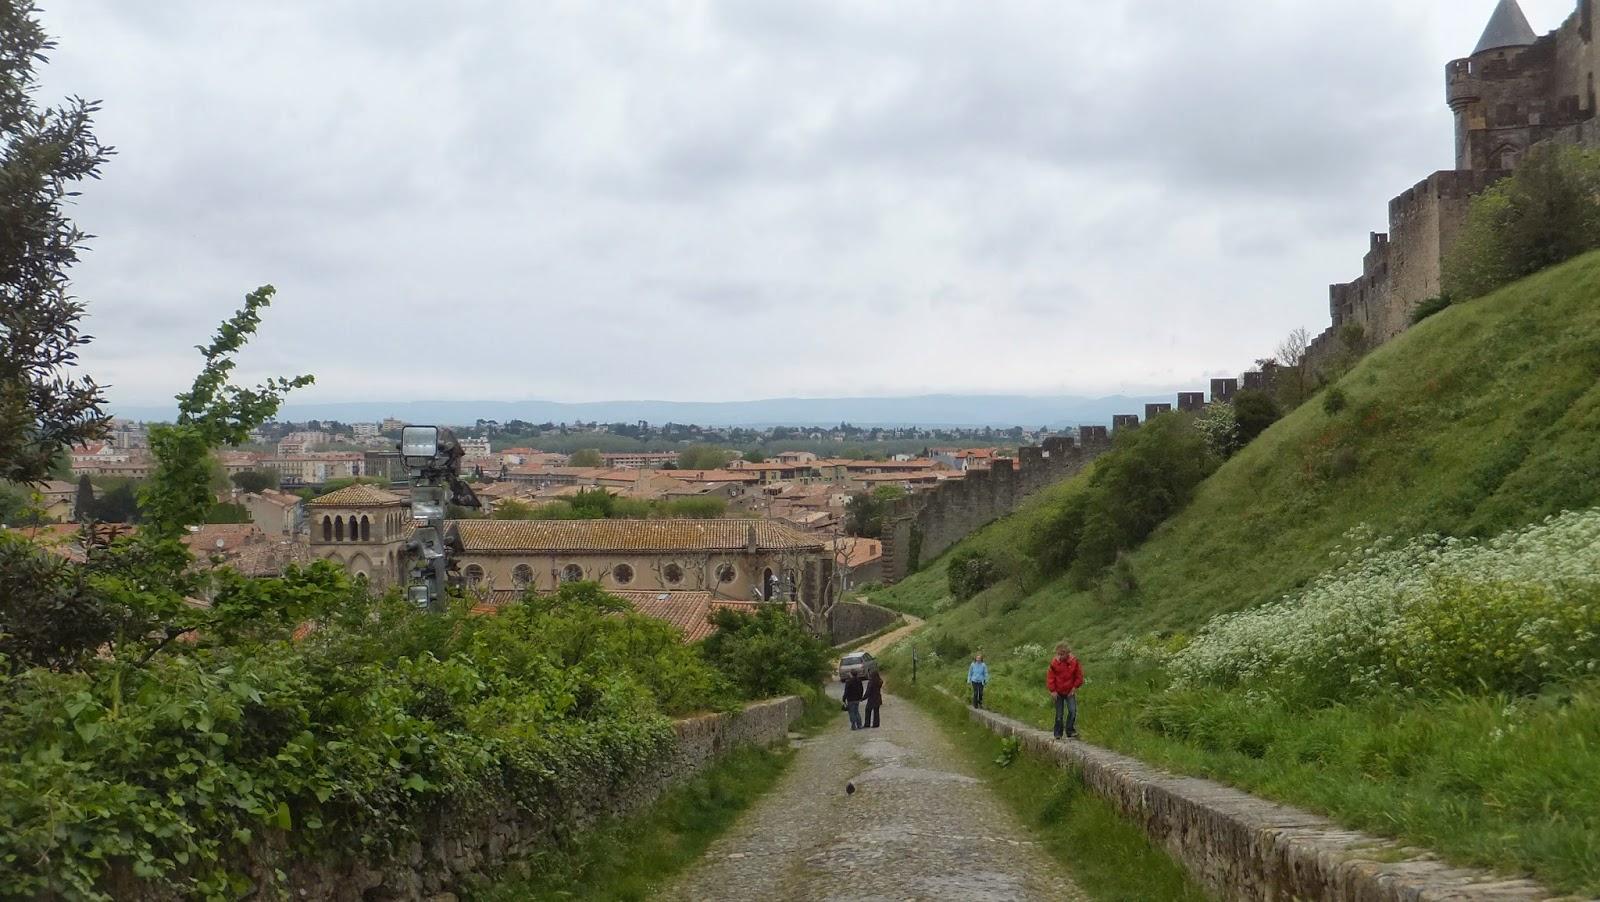 Carcasona, Francia, Carcassonne, blog de viajes, Elisa N, Argentina, Canal de Midi, Canal del Mediodía